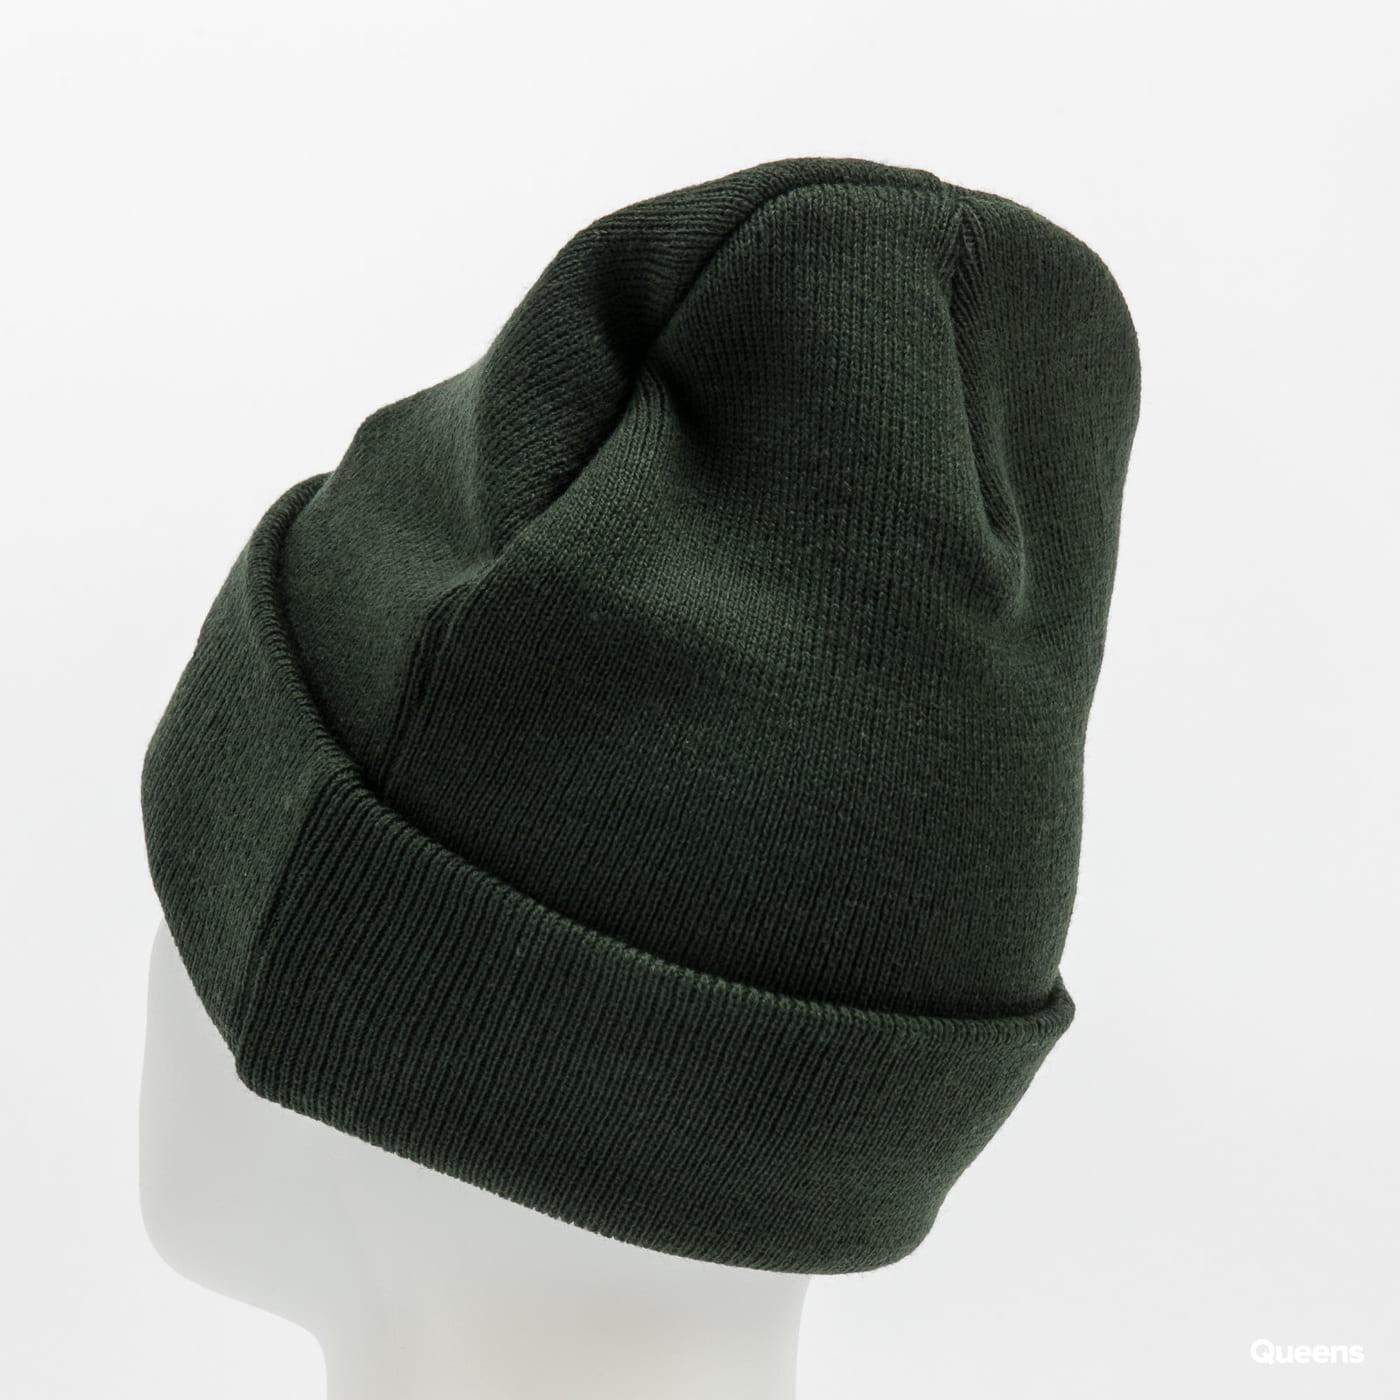 Alife Collegiate Beanie tmavě zelený